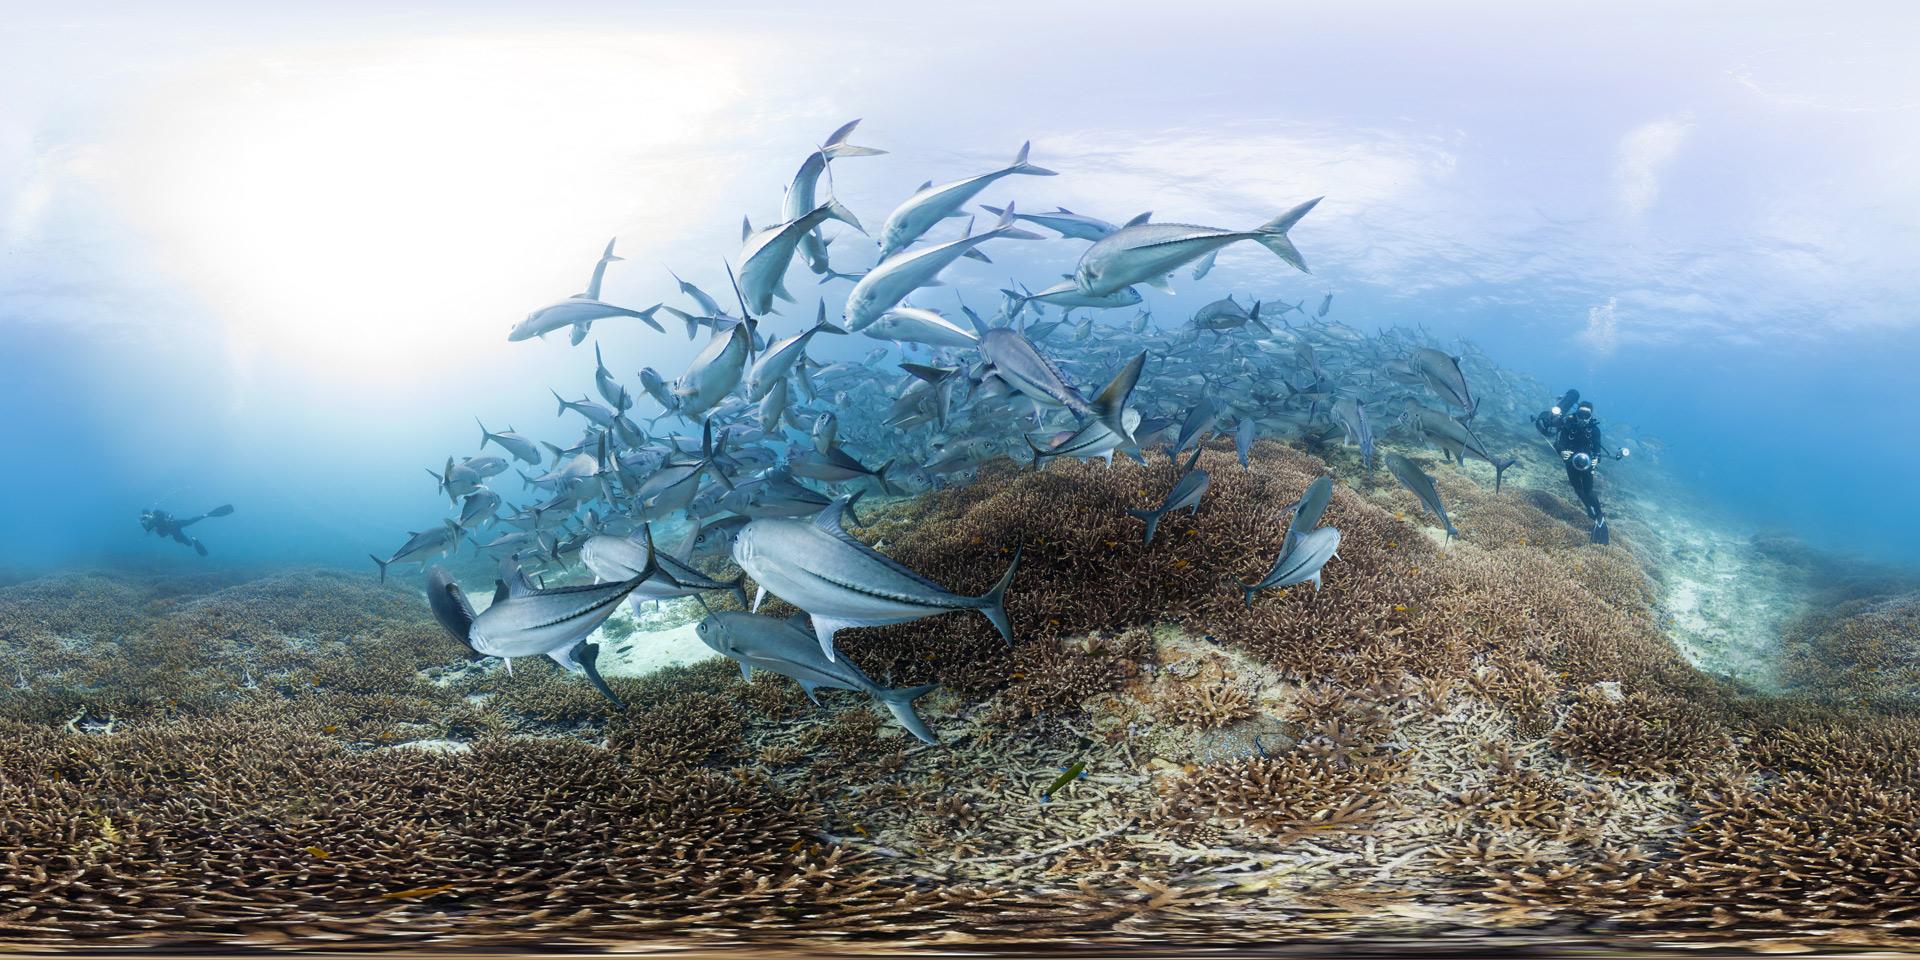 Trevally-at-Lady-Elliot-Island---Photo-By-The-Ocean-Agency_XLCatlin-Seaview-Survey_Christophe-Bailhache.jpg